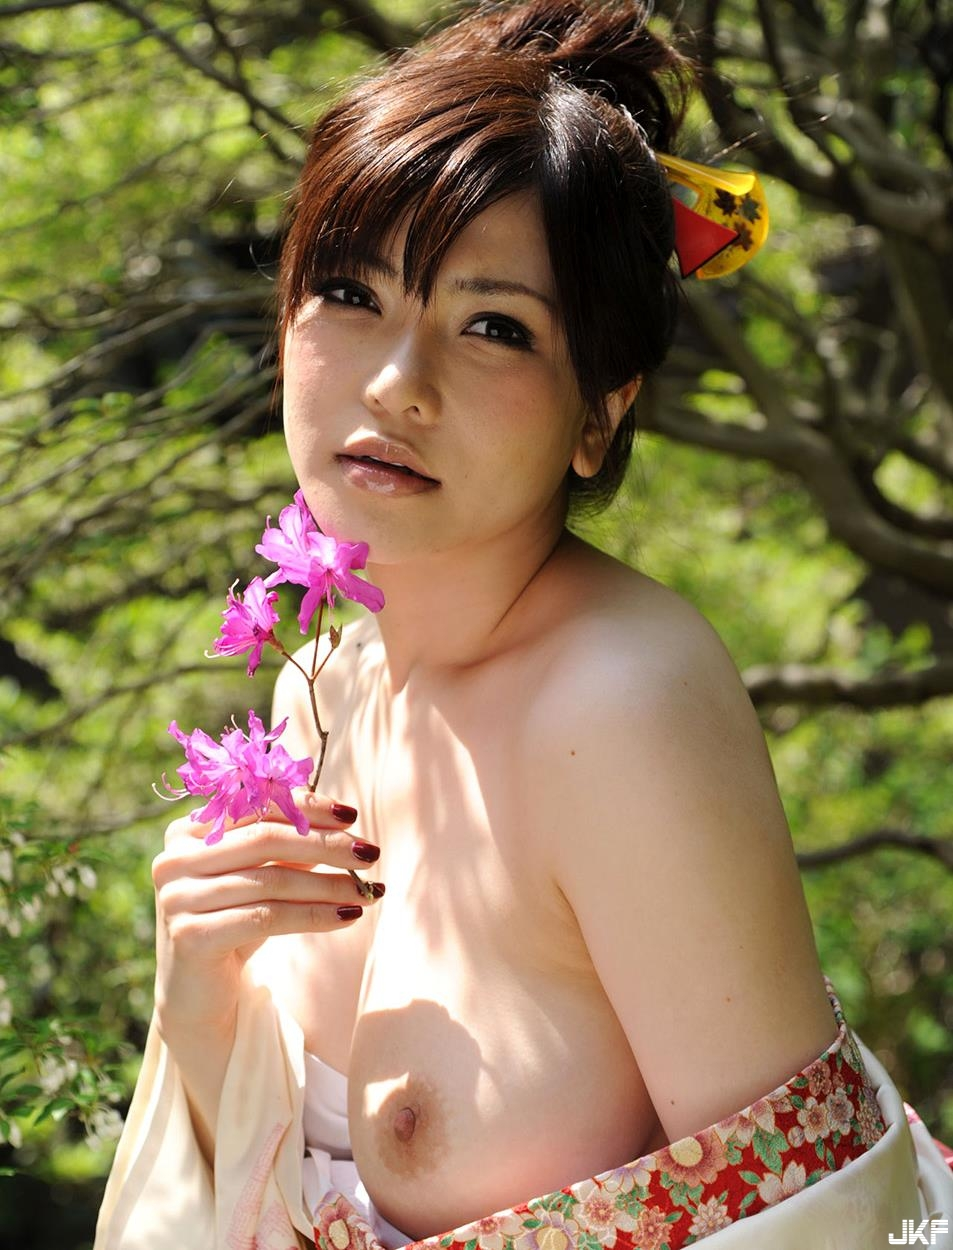 okita_anri_160806_025.jpg